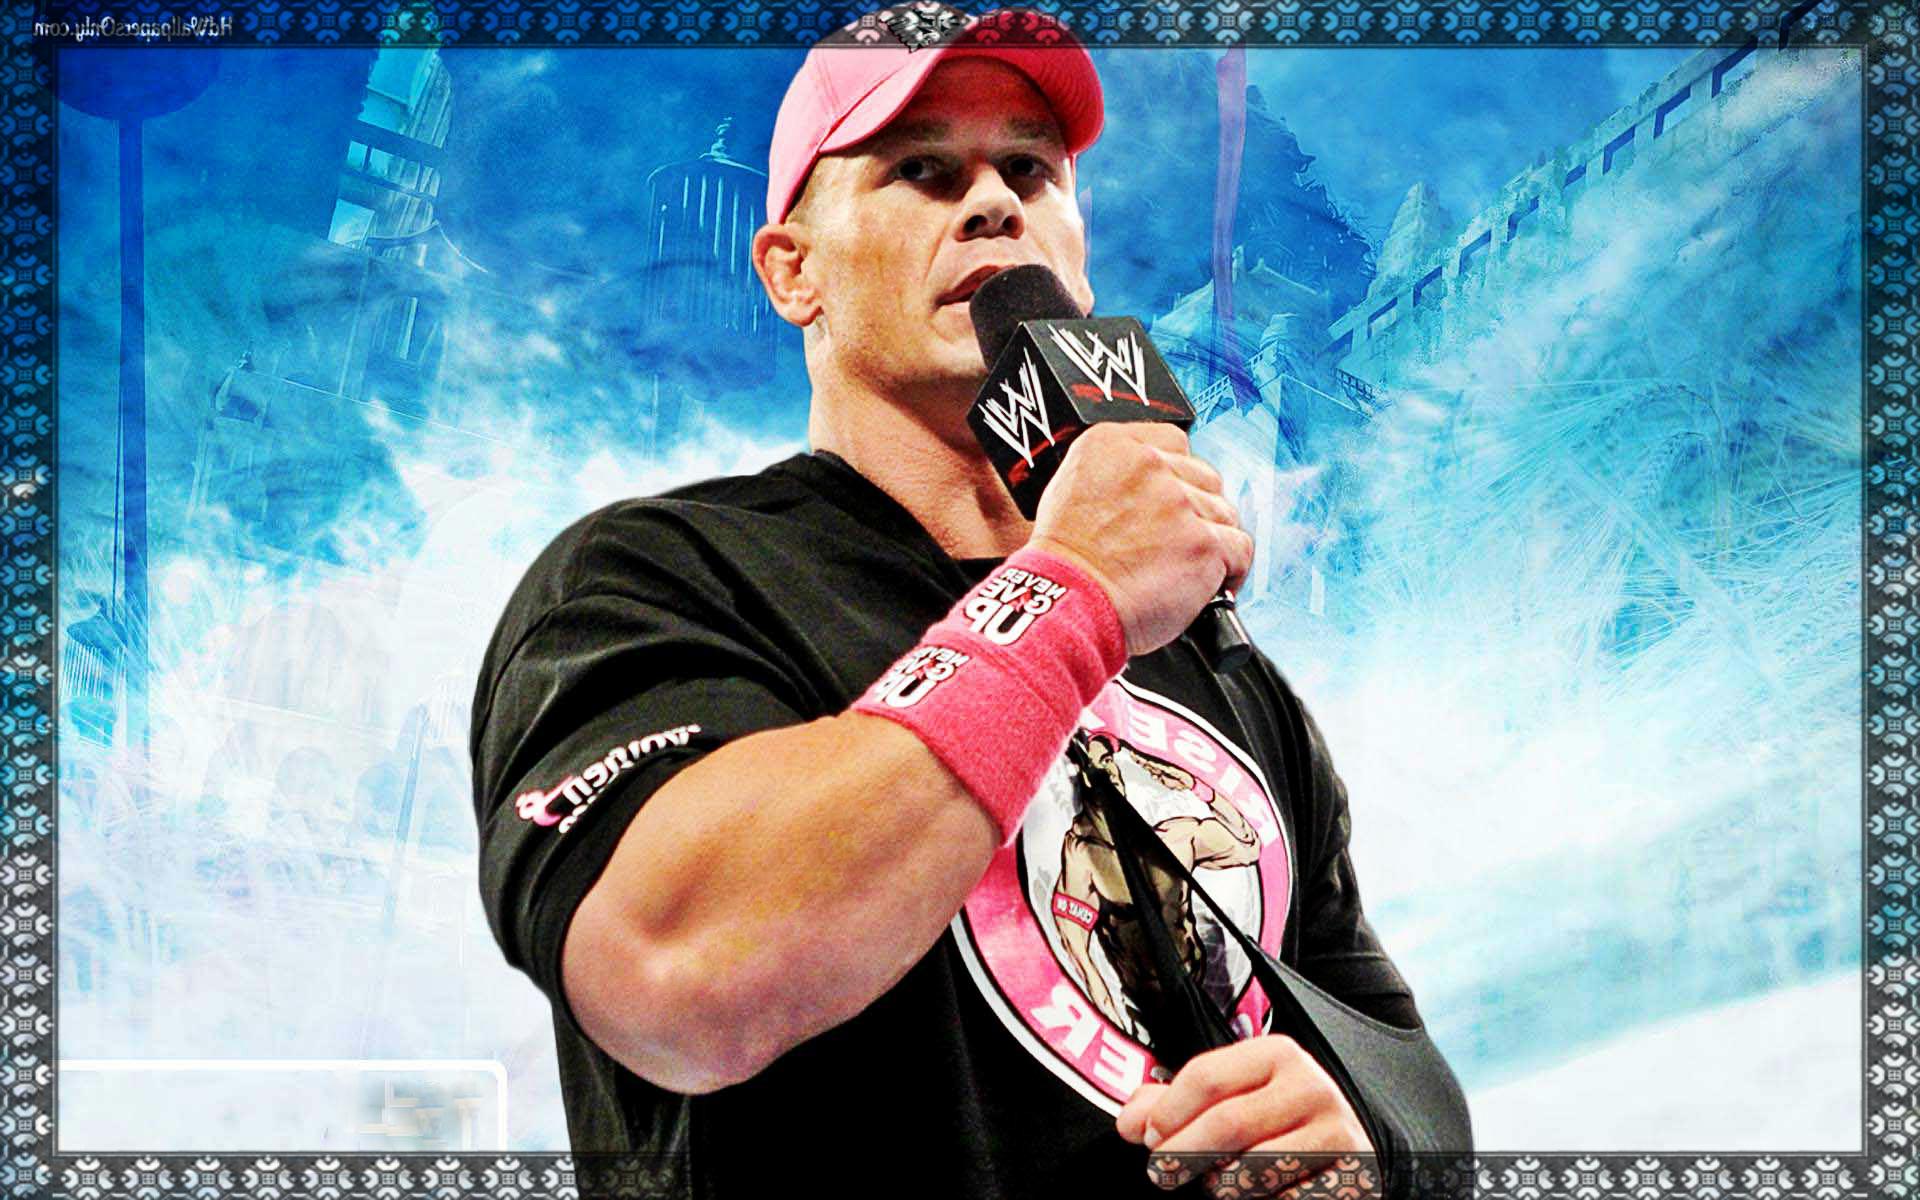 John Cena Wallpapers 2015 Hd